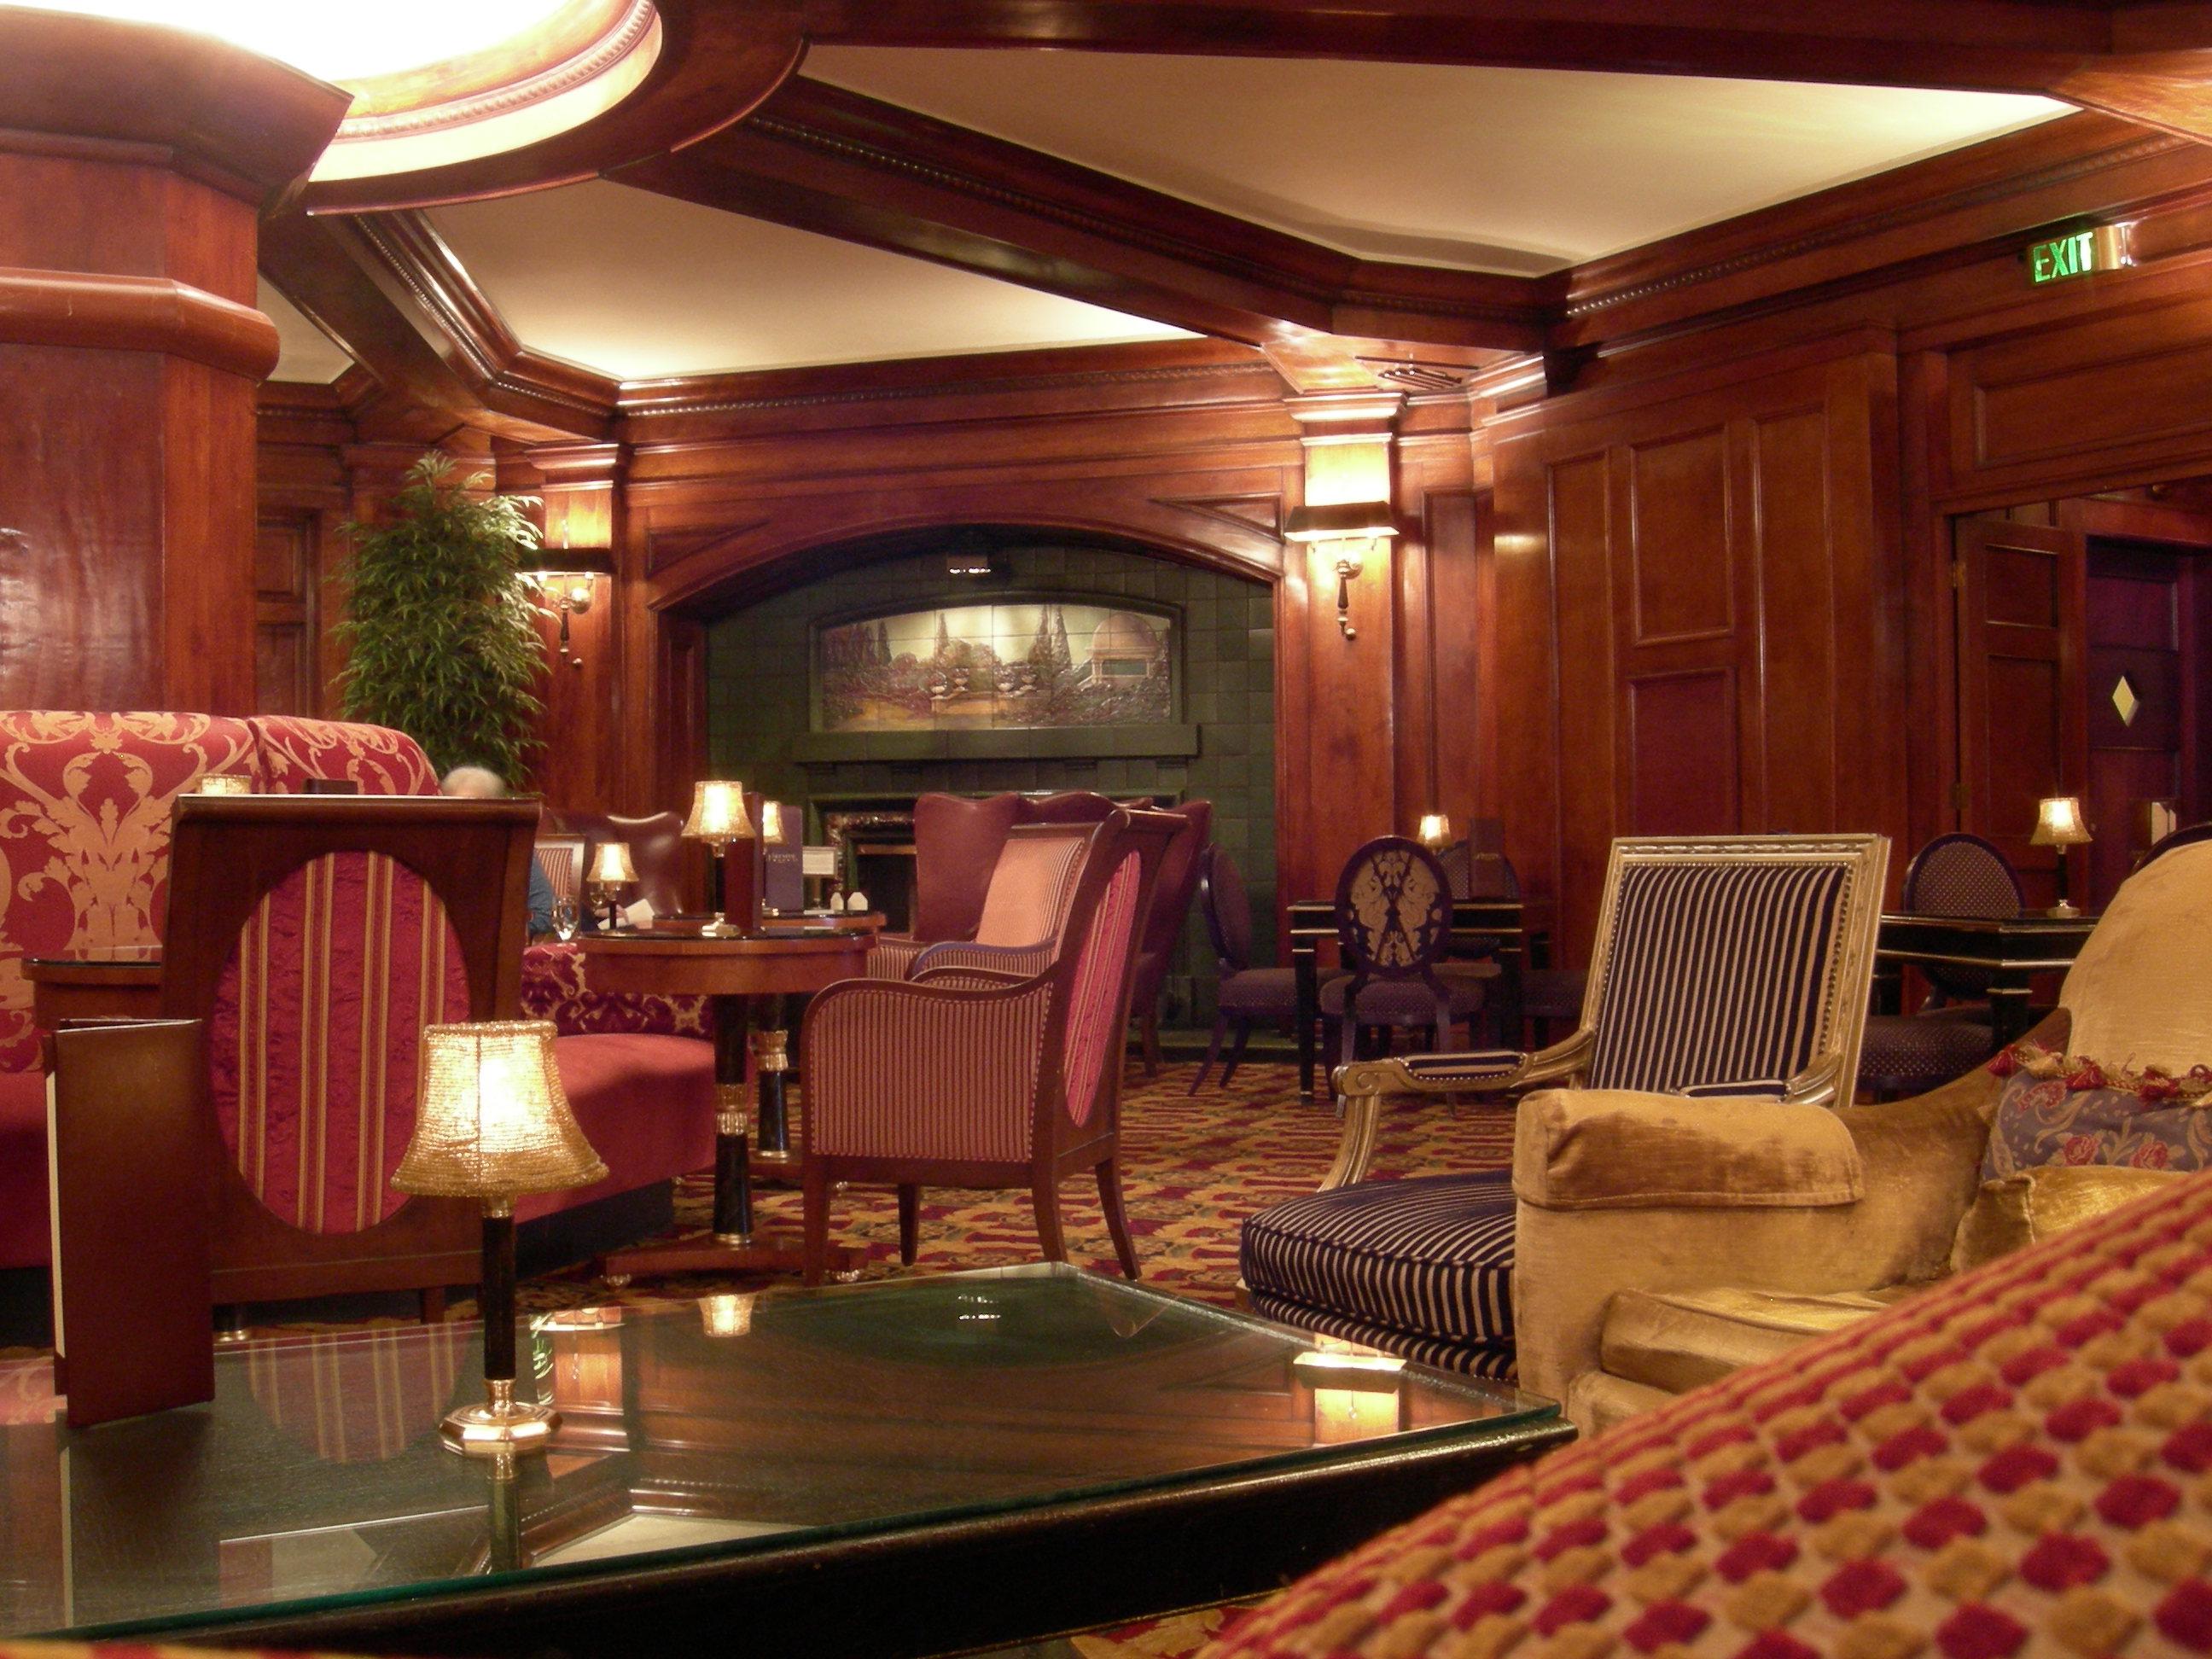 File:Seattle - Sorrento Hotel lobby 02.jpg - Wikimedia Commons